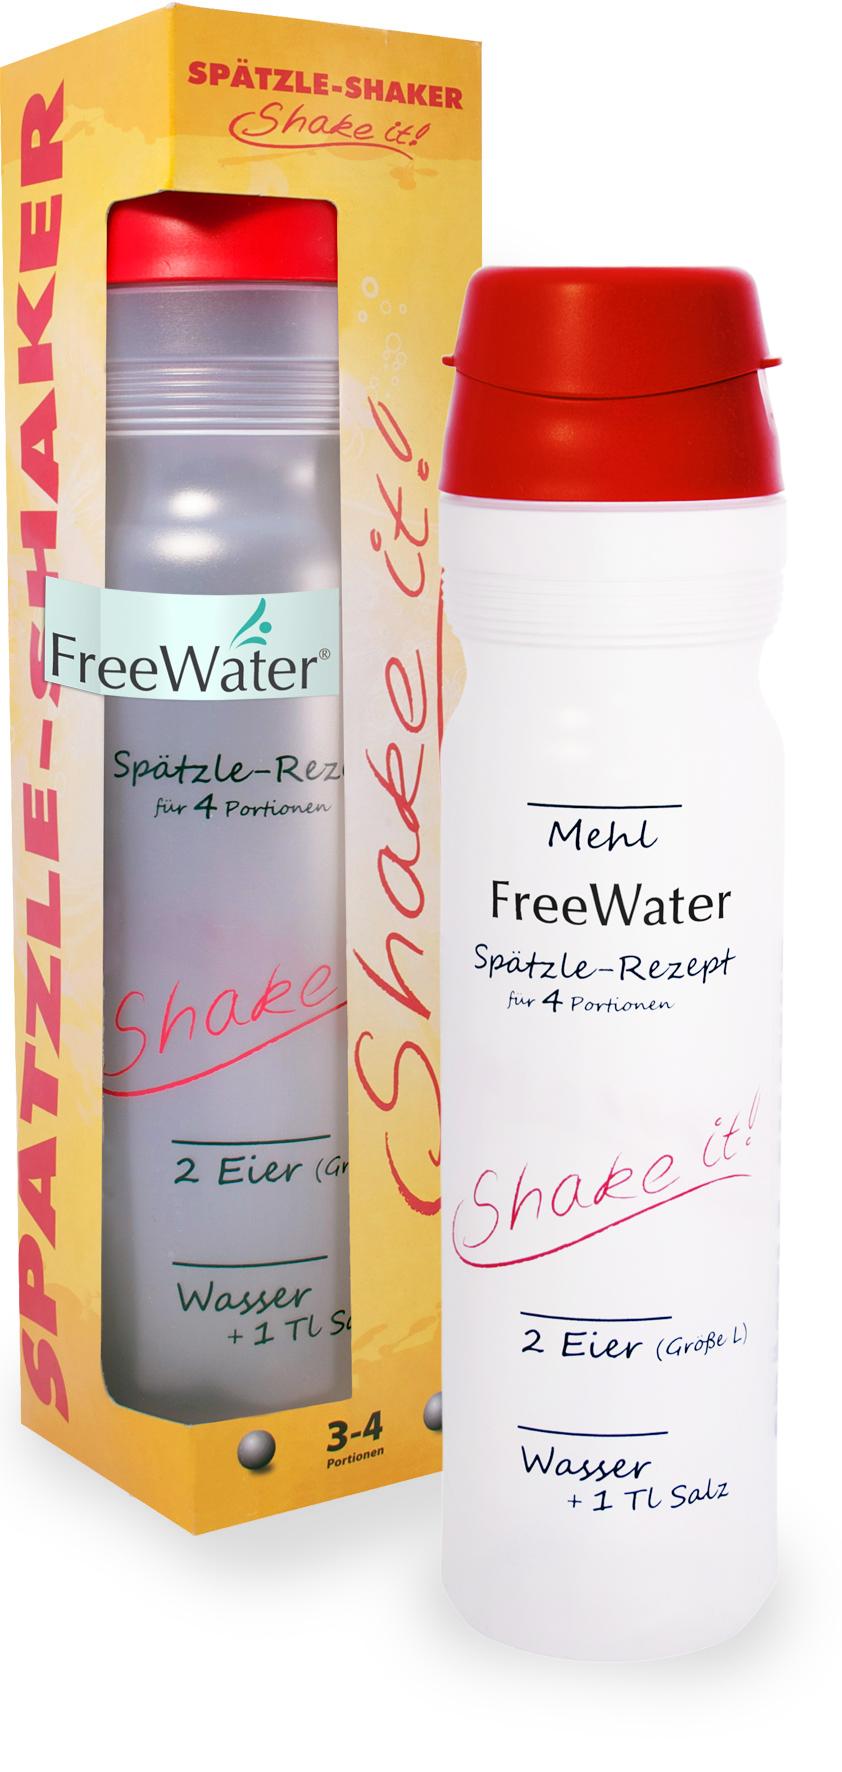 FreeWater Spätzleshaker 1,0l Transparent